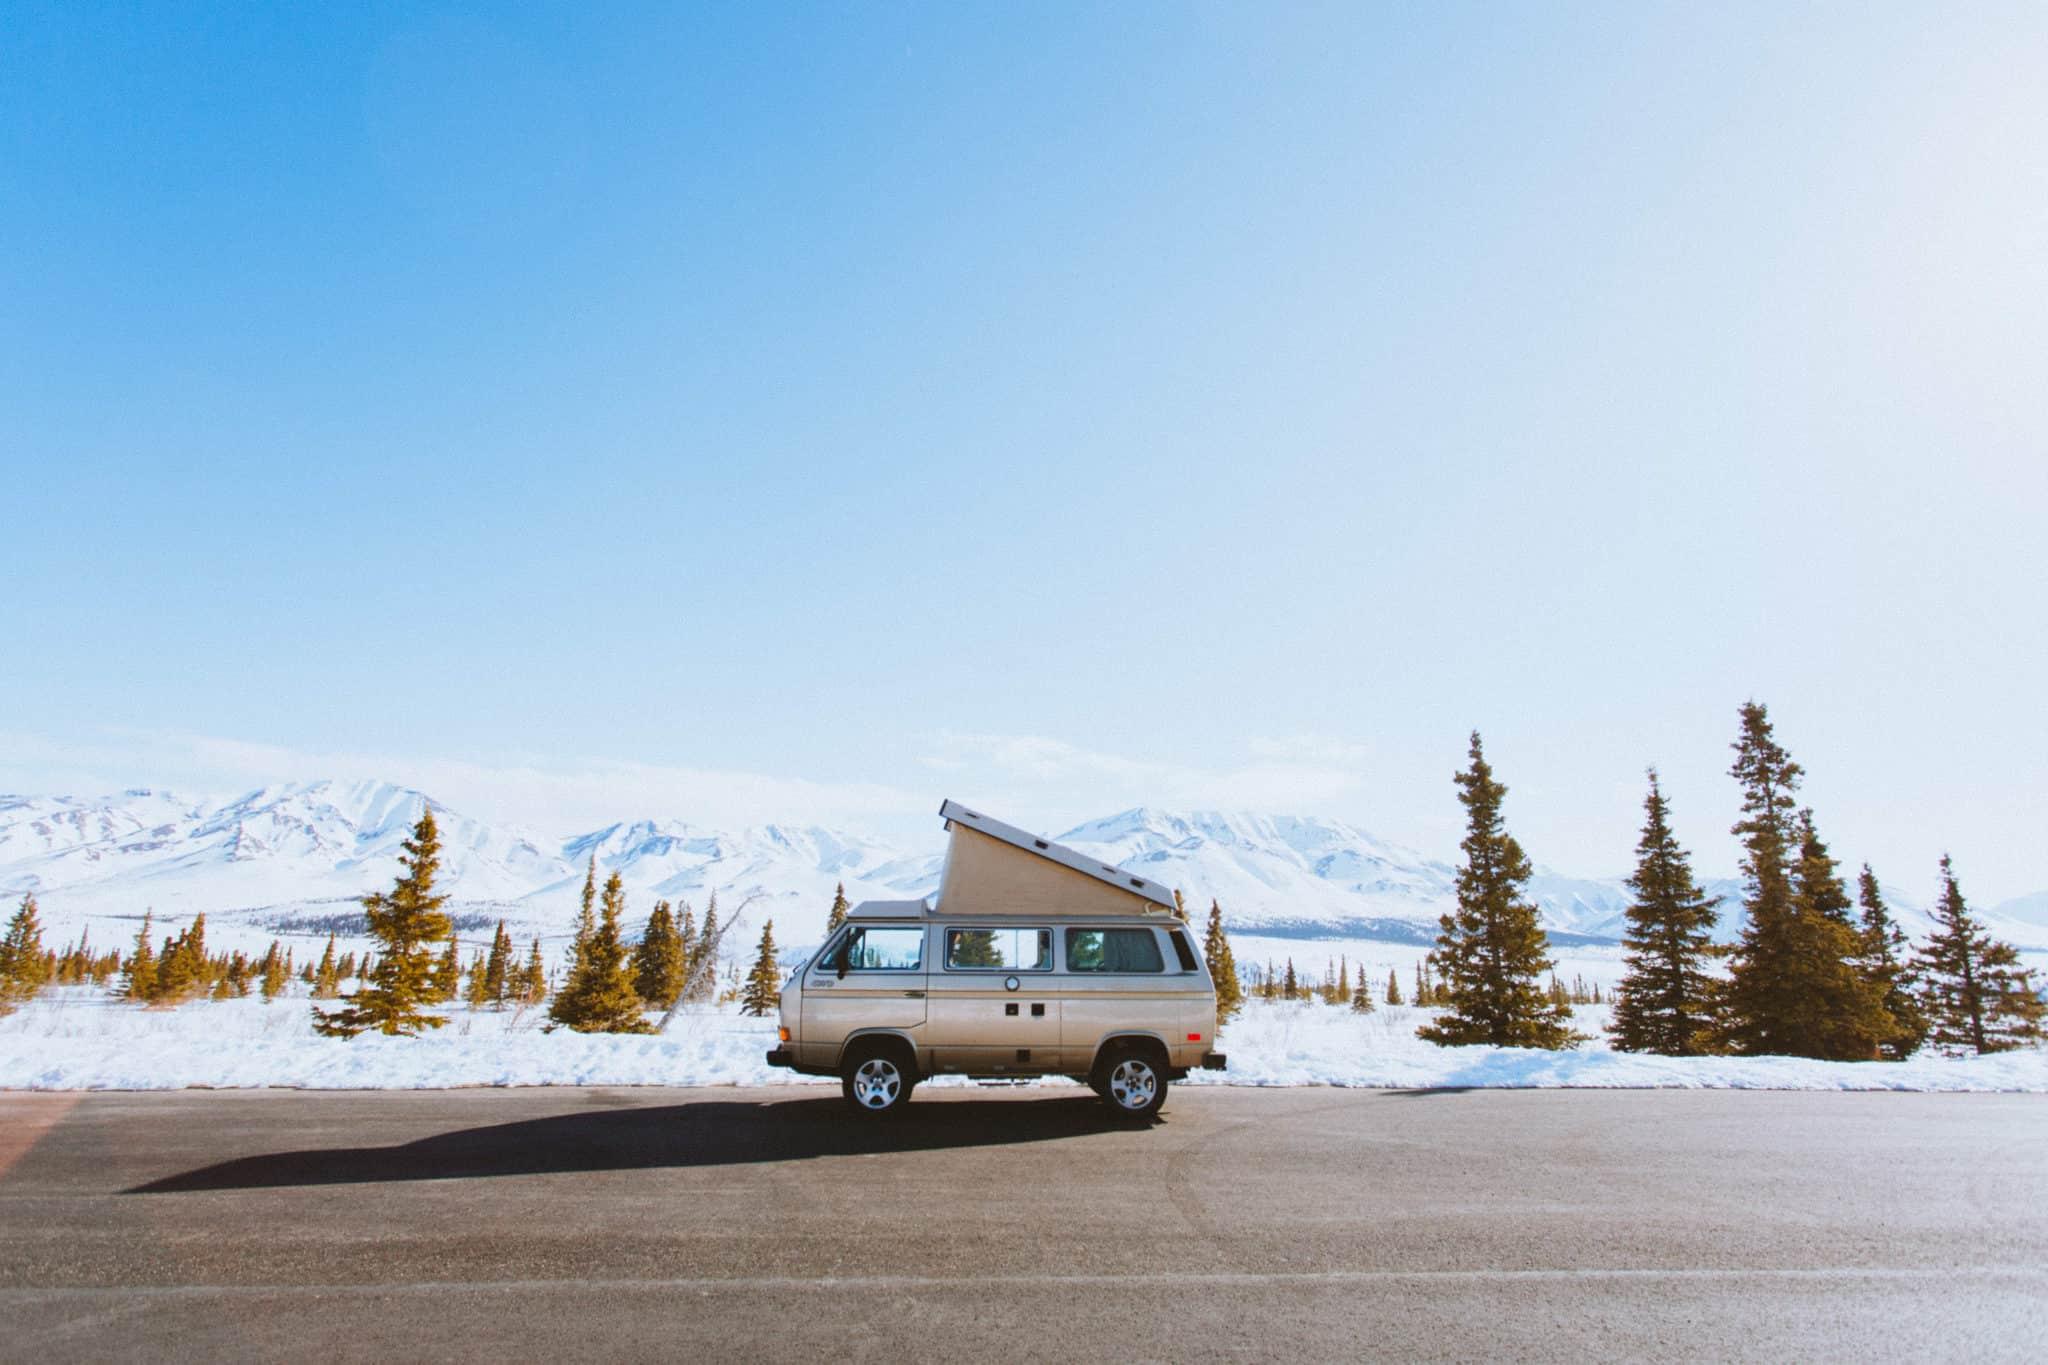 Things To Do In Fairbanks - Trickster Trips VW Van